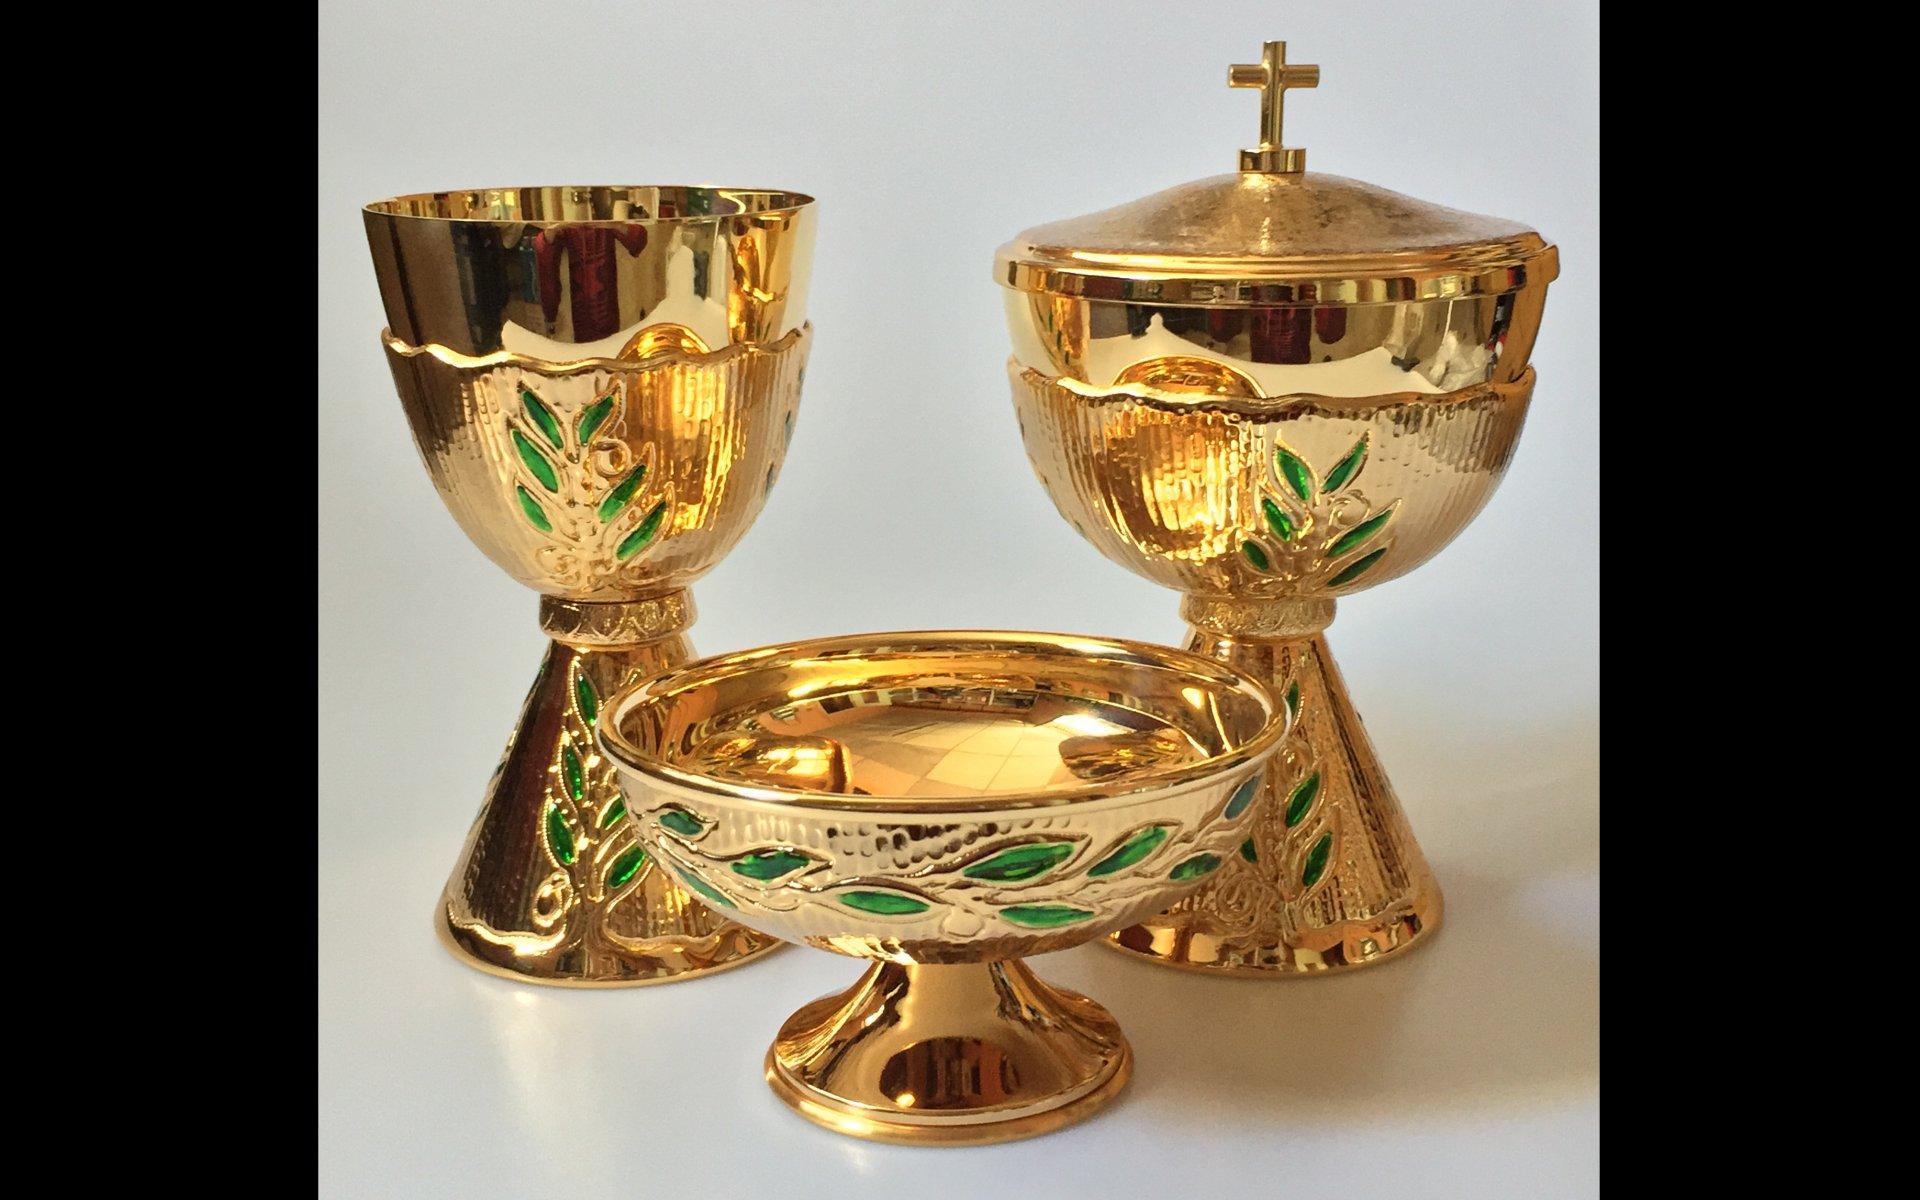 Golden chalice ciboria and bowl paten with nail varnish for Arredi sacri milano